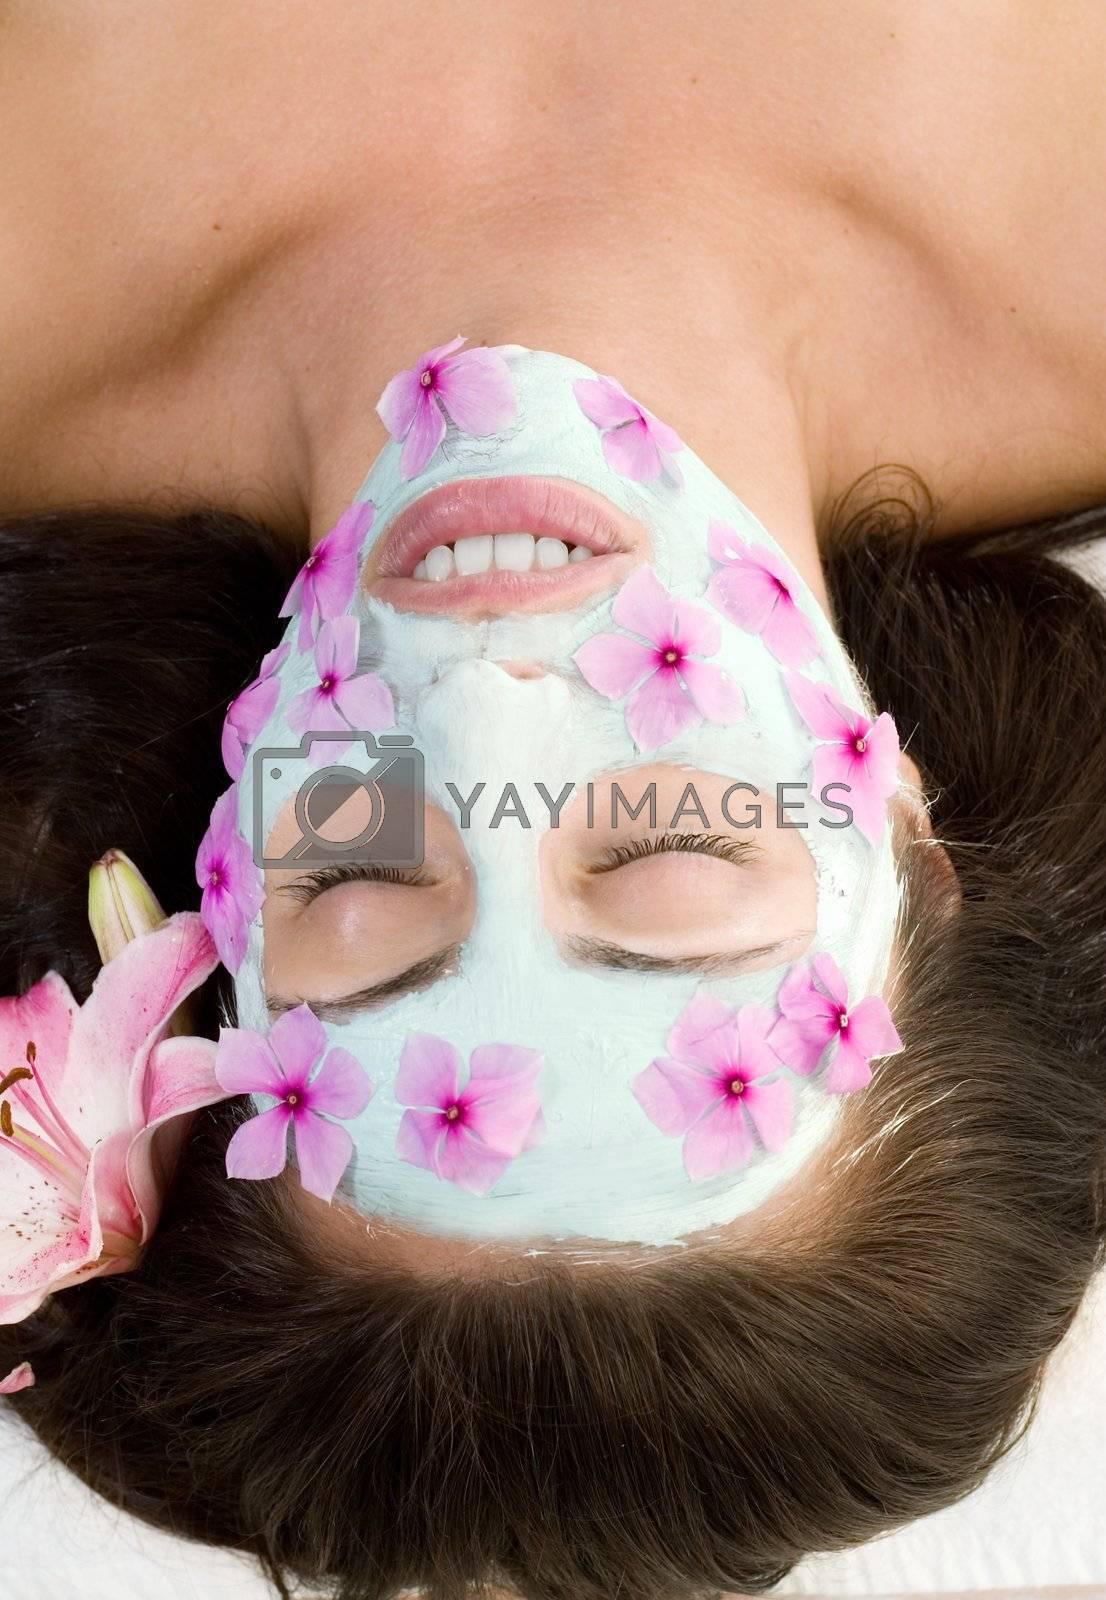 Spa Radiance - beauty mask by lovleah